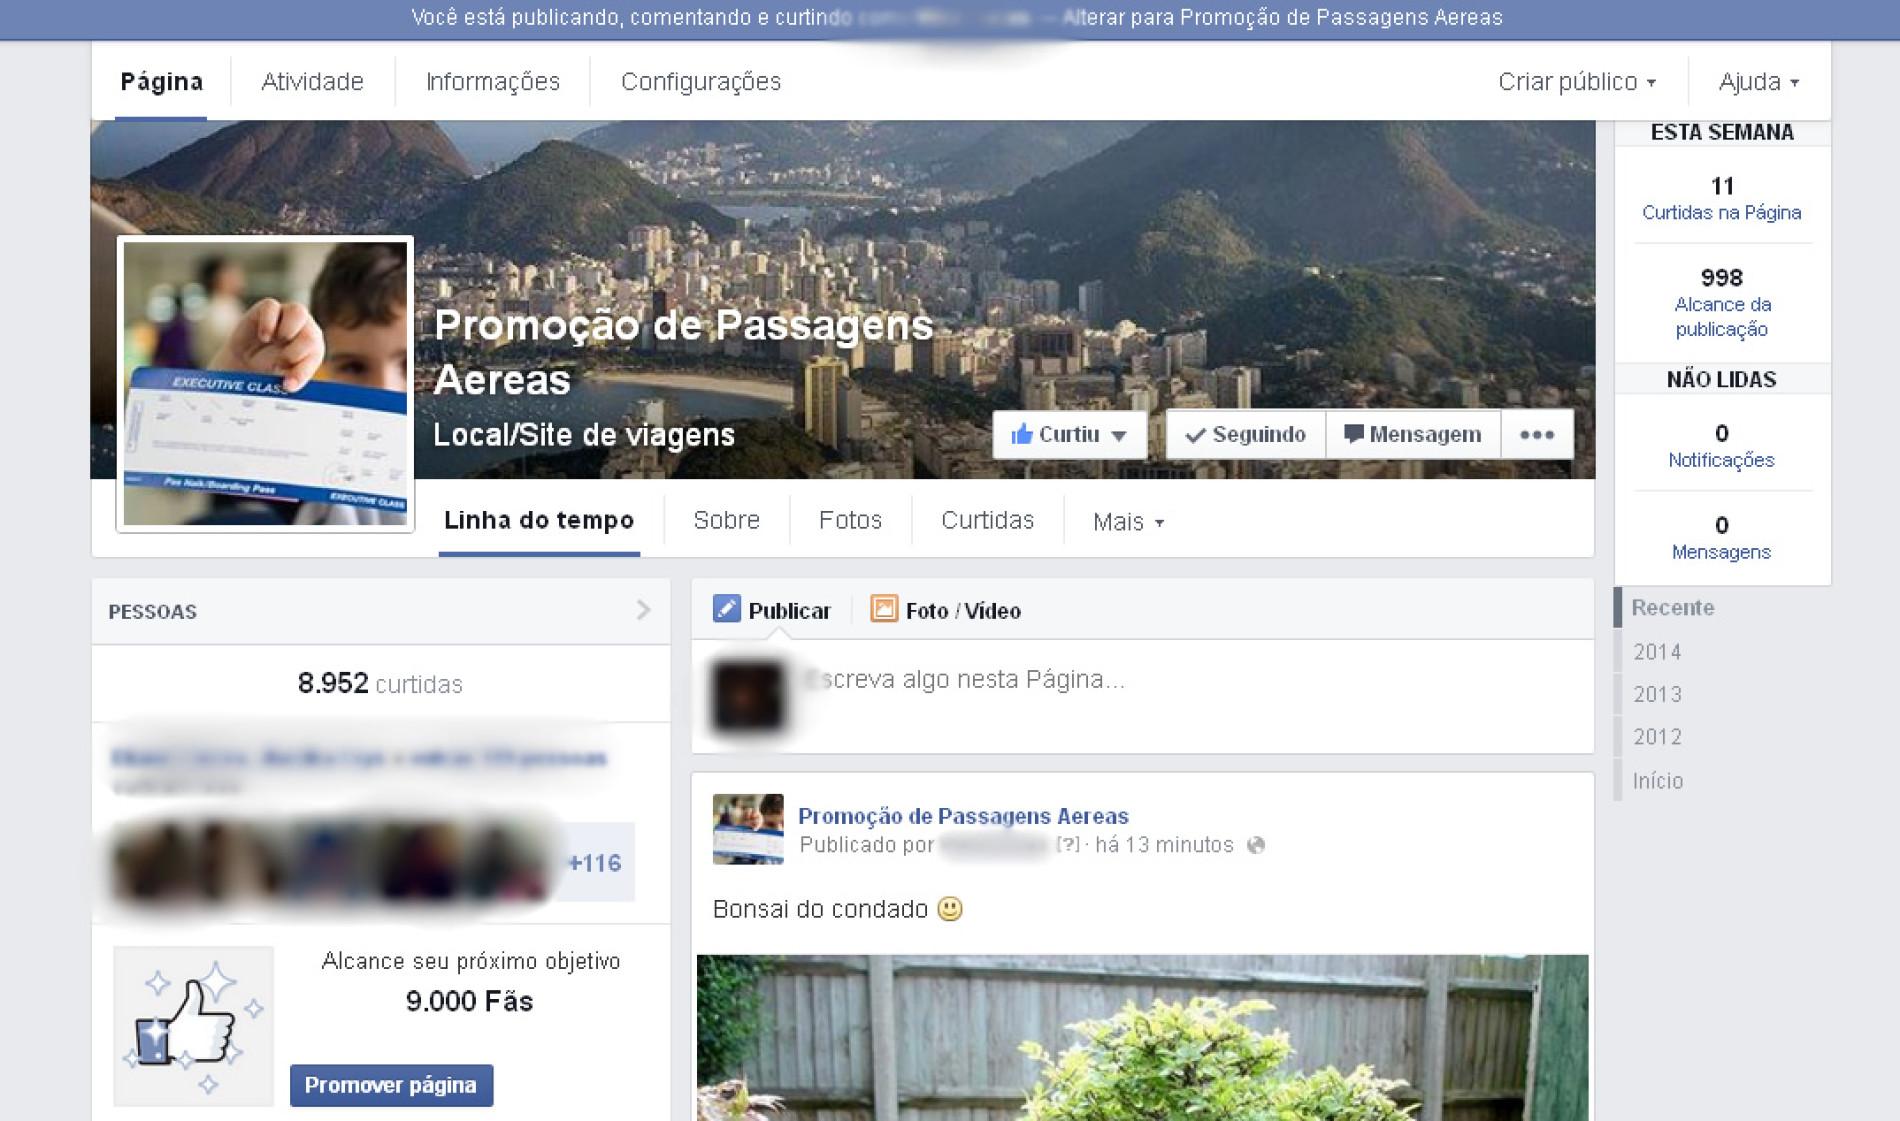 Facebook acaba de atualizar as Fan Pages com novo layout